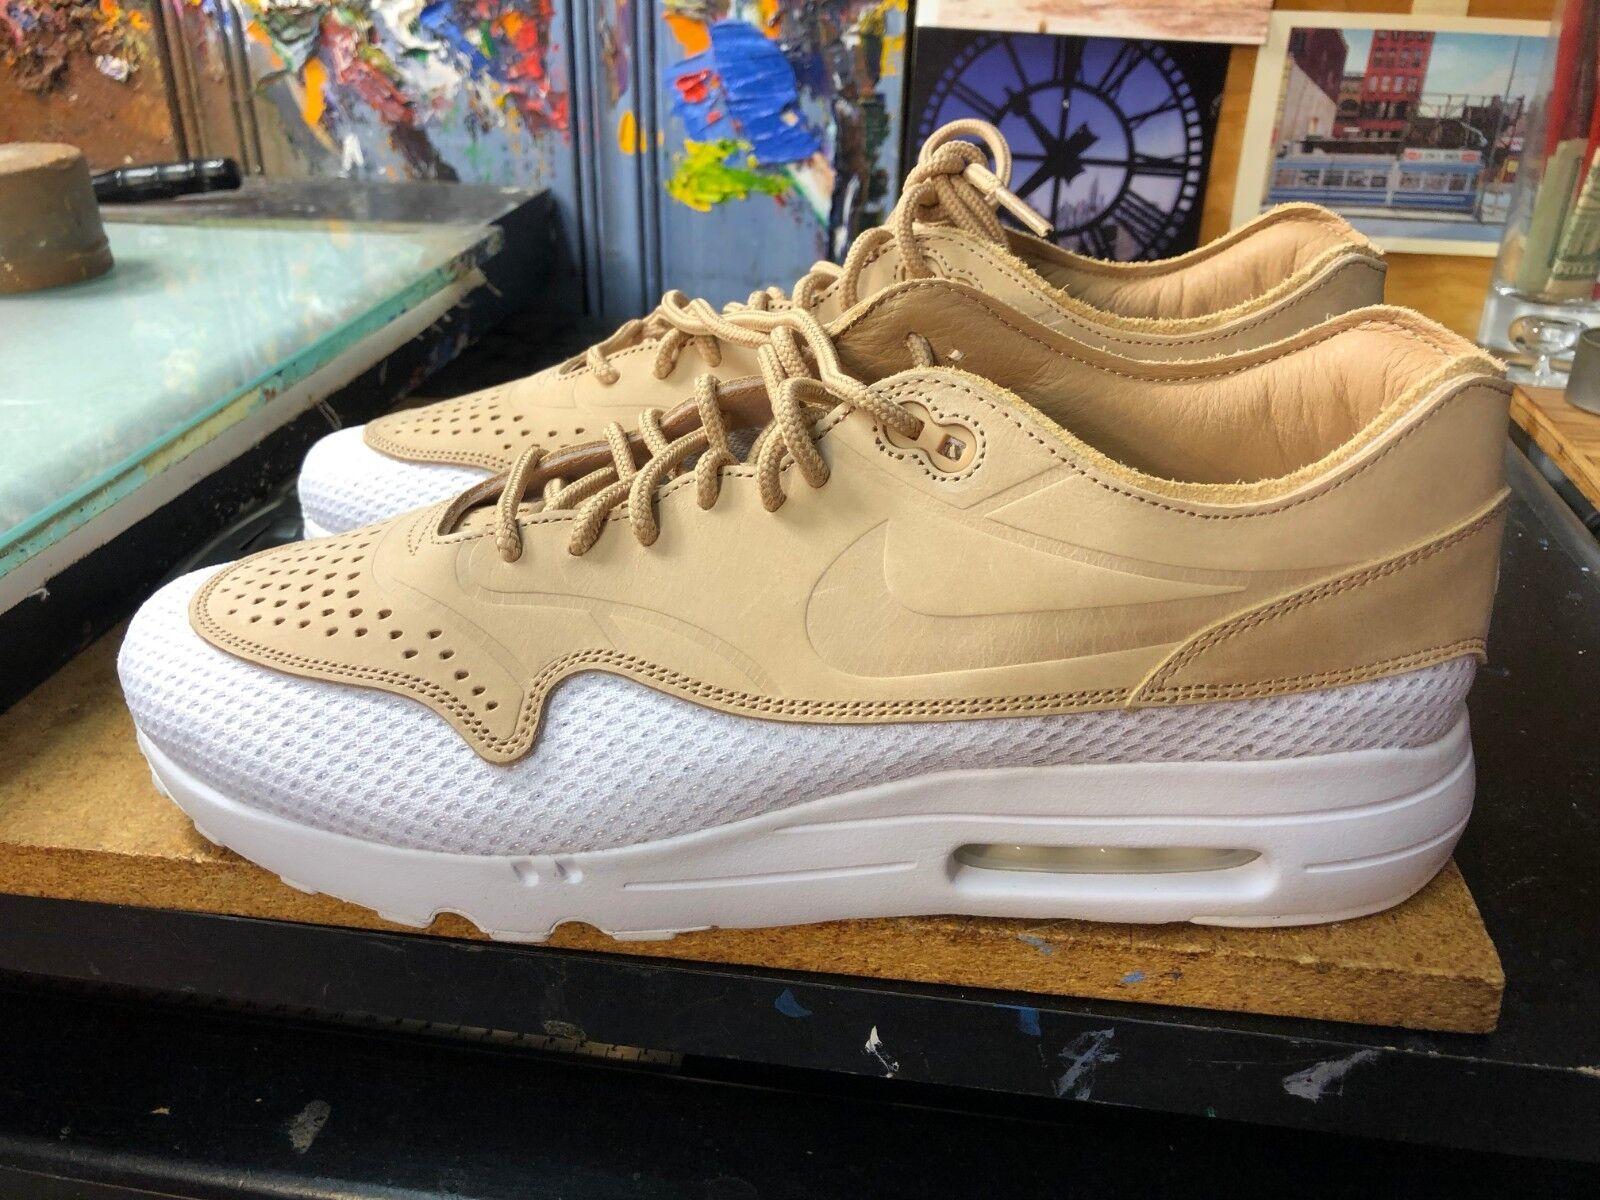 Nike Air Max 1 Ultra 2.0 Premium Breathe Vachetta Tan US 10.5 Men AO2449 200